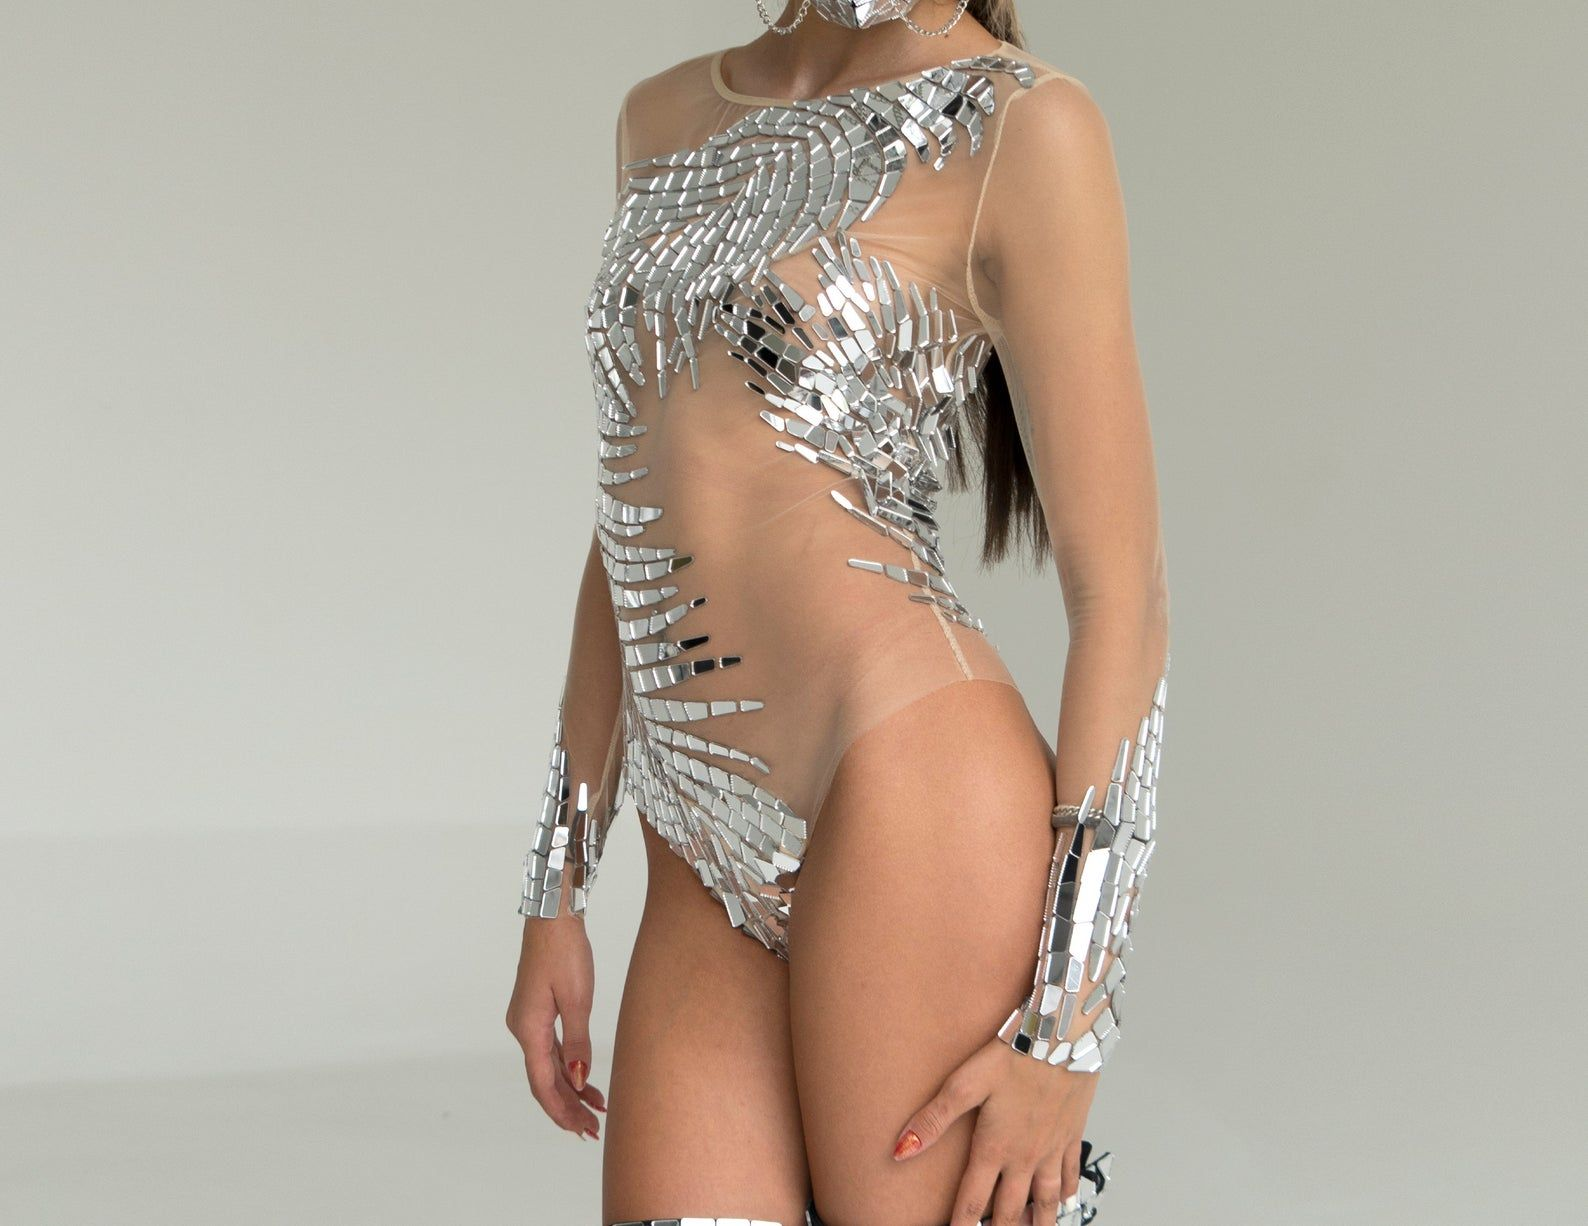 Sequin silver mirror dance bodysuit on transparent